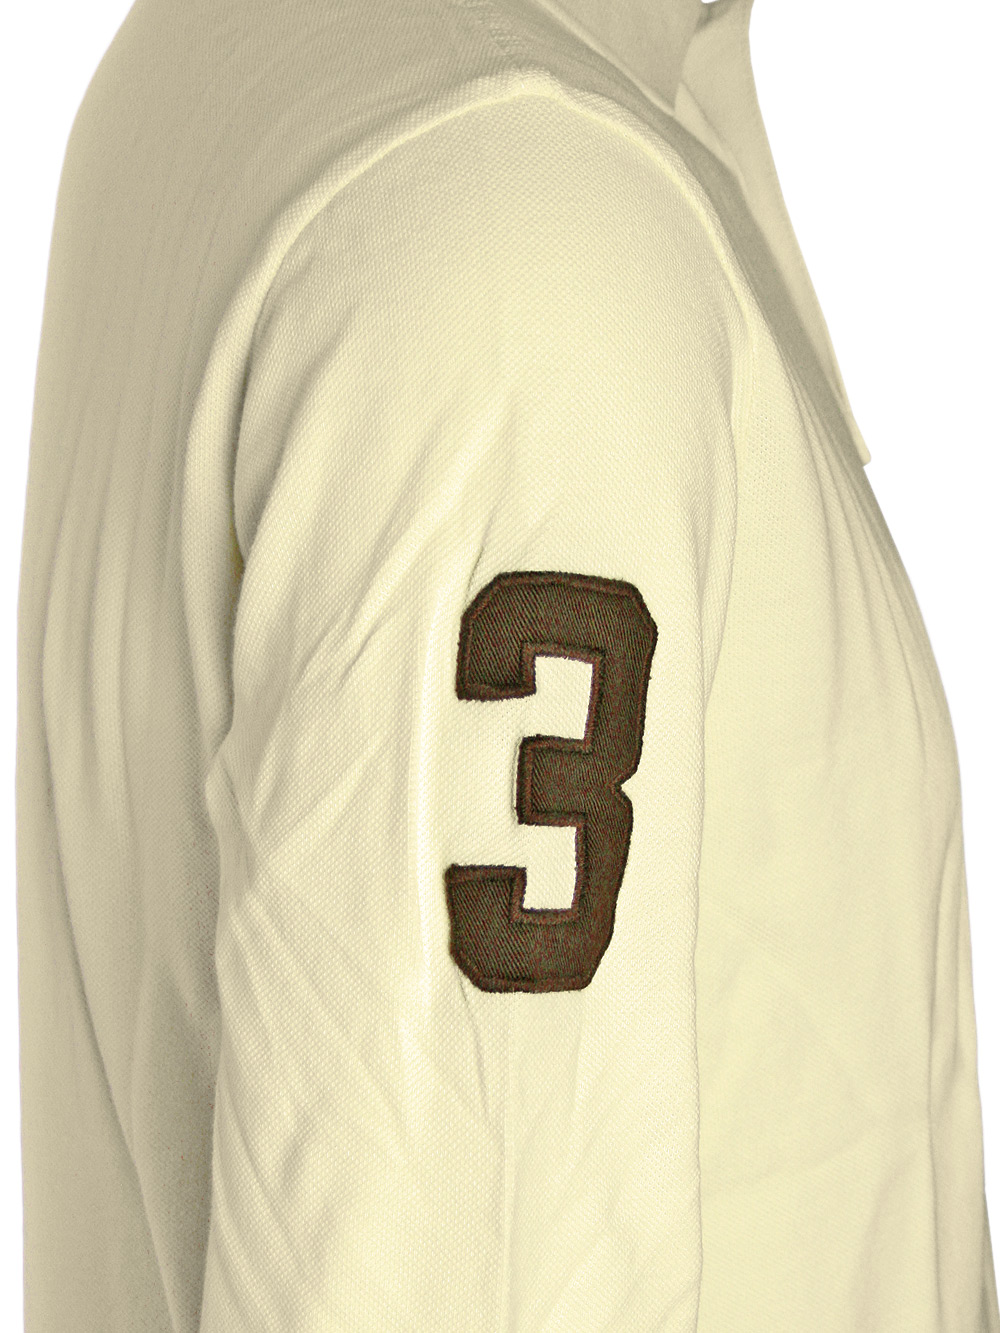 ralph lauren herren langarm polo shirt crest beige neu ebay. Black Bedroom Furniture Sets. Home Design Ideas